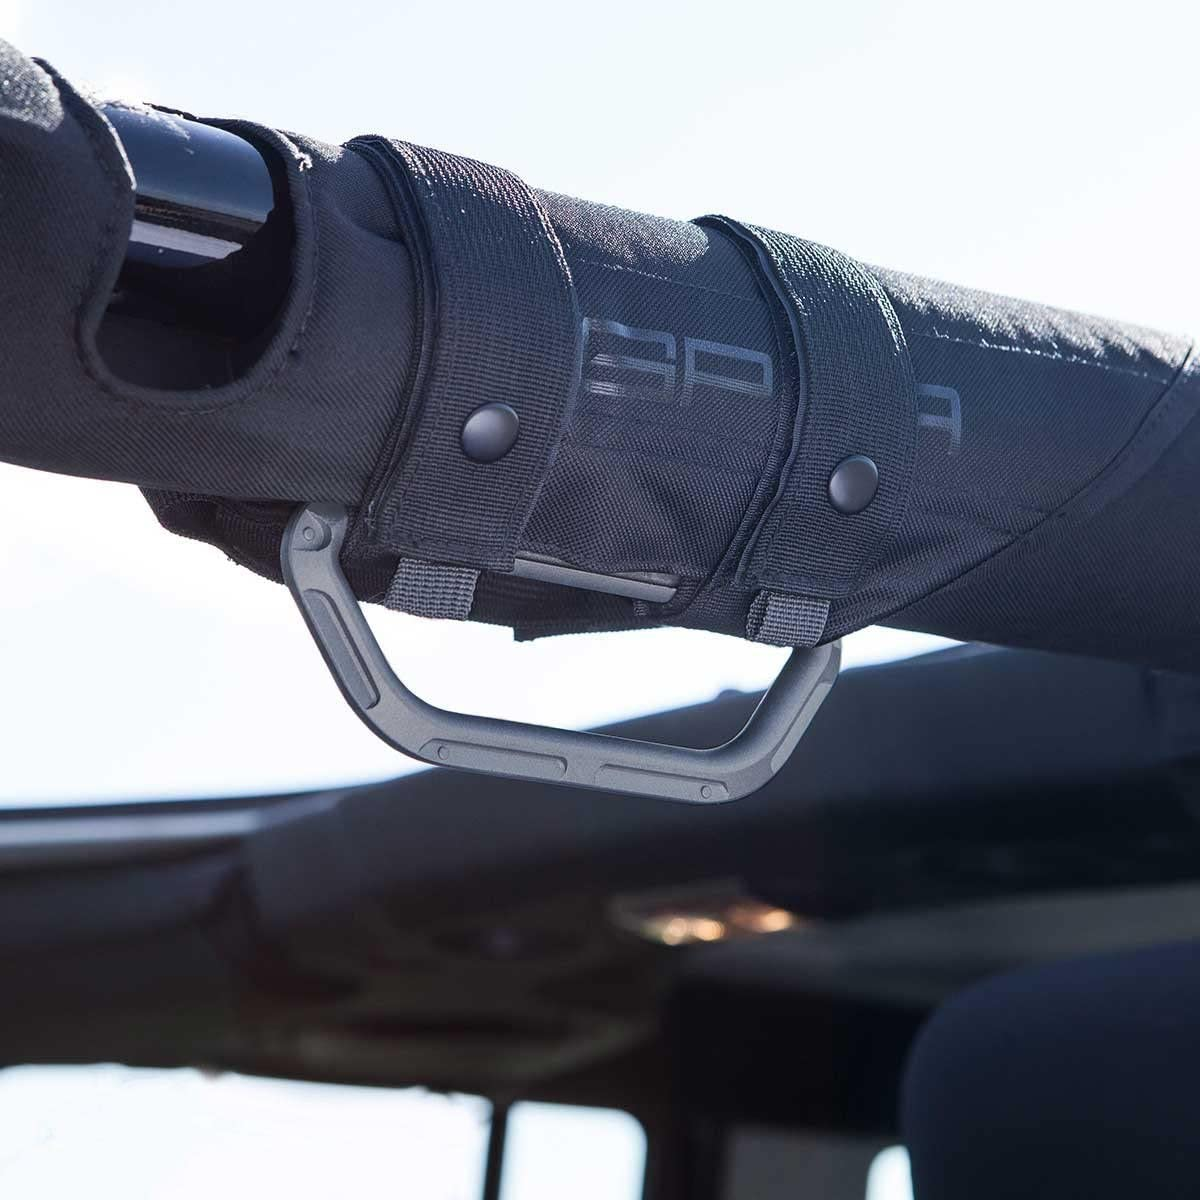 GPCA Metal Grab Handle GP-Grip LITE for Jeep Wrangler JL JT JK Sport Sahara Freedom Rubicon 4DR 2DR 2007-2020 with 3 roll bar Patented Pair, Jet Black